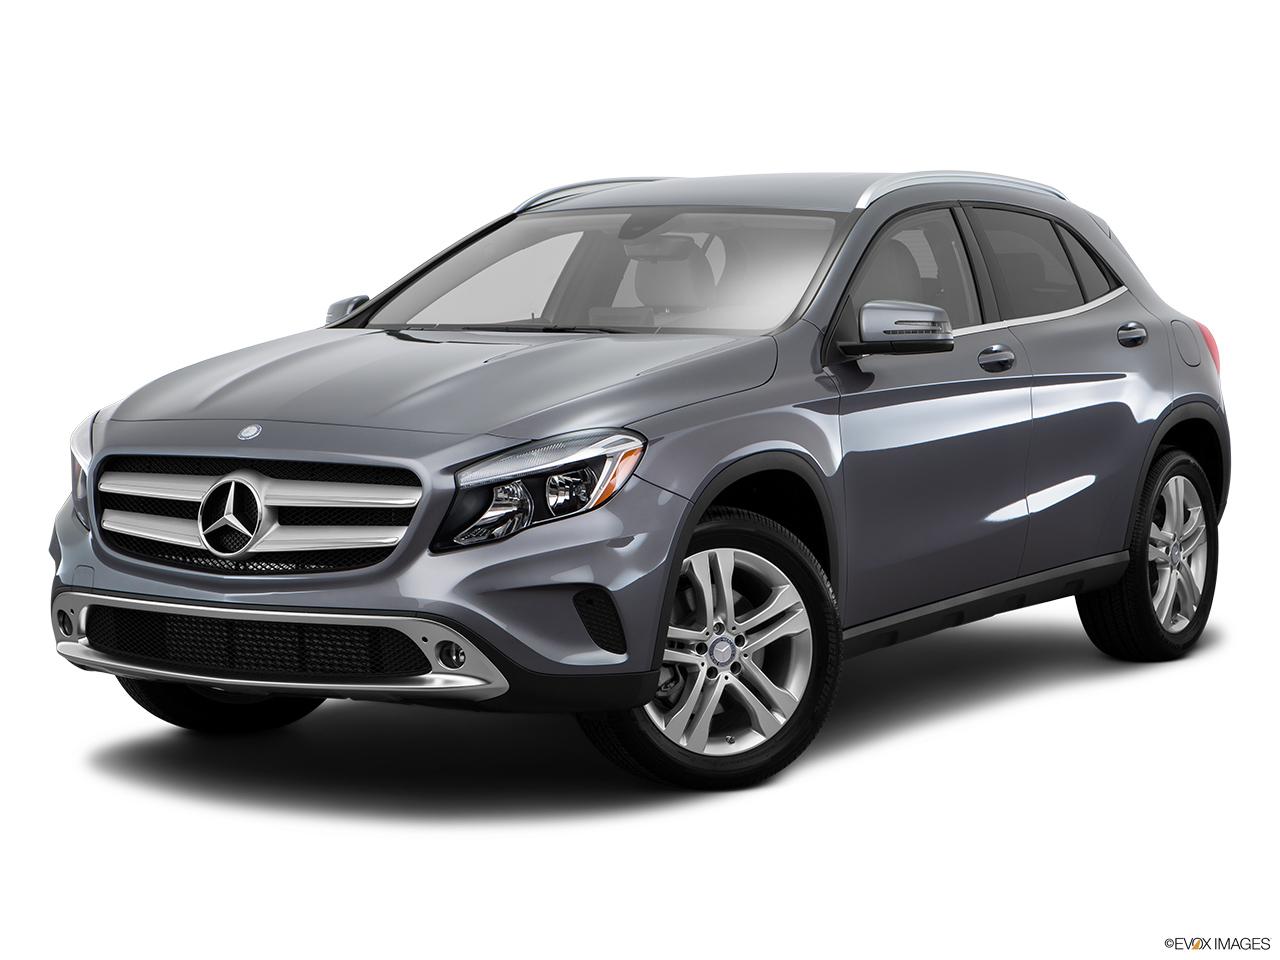 car pictures list for mercedes benz gla 2016 250 qatar yallamotor. Black Bedroom Furniture Sets. Home Design Ideas